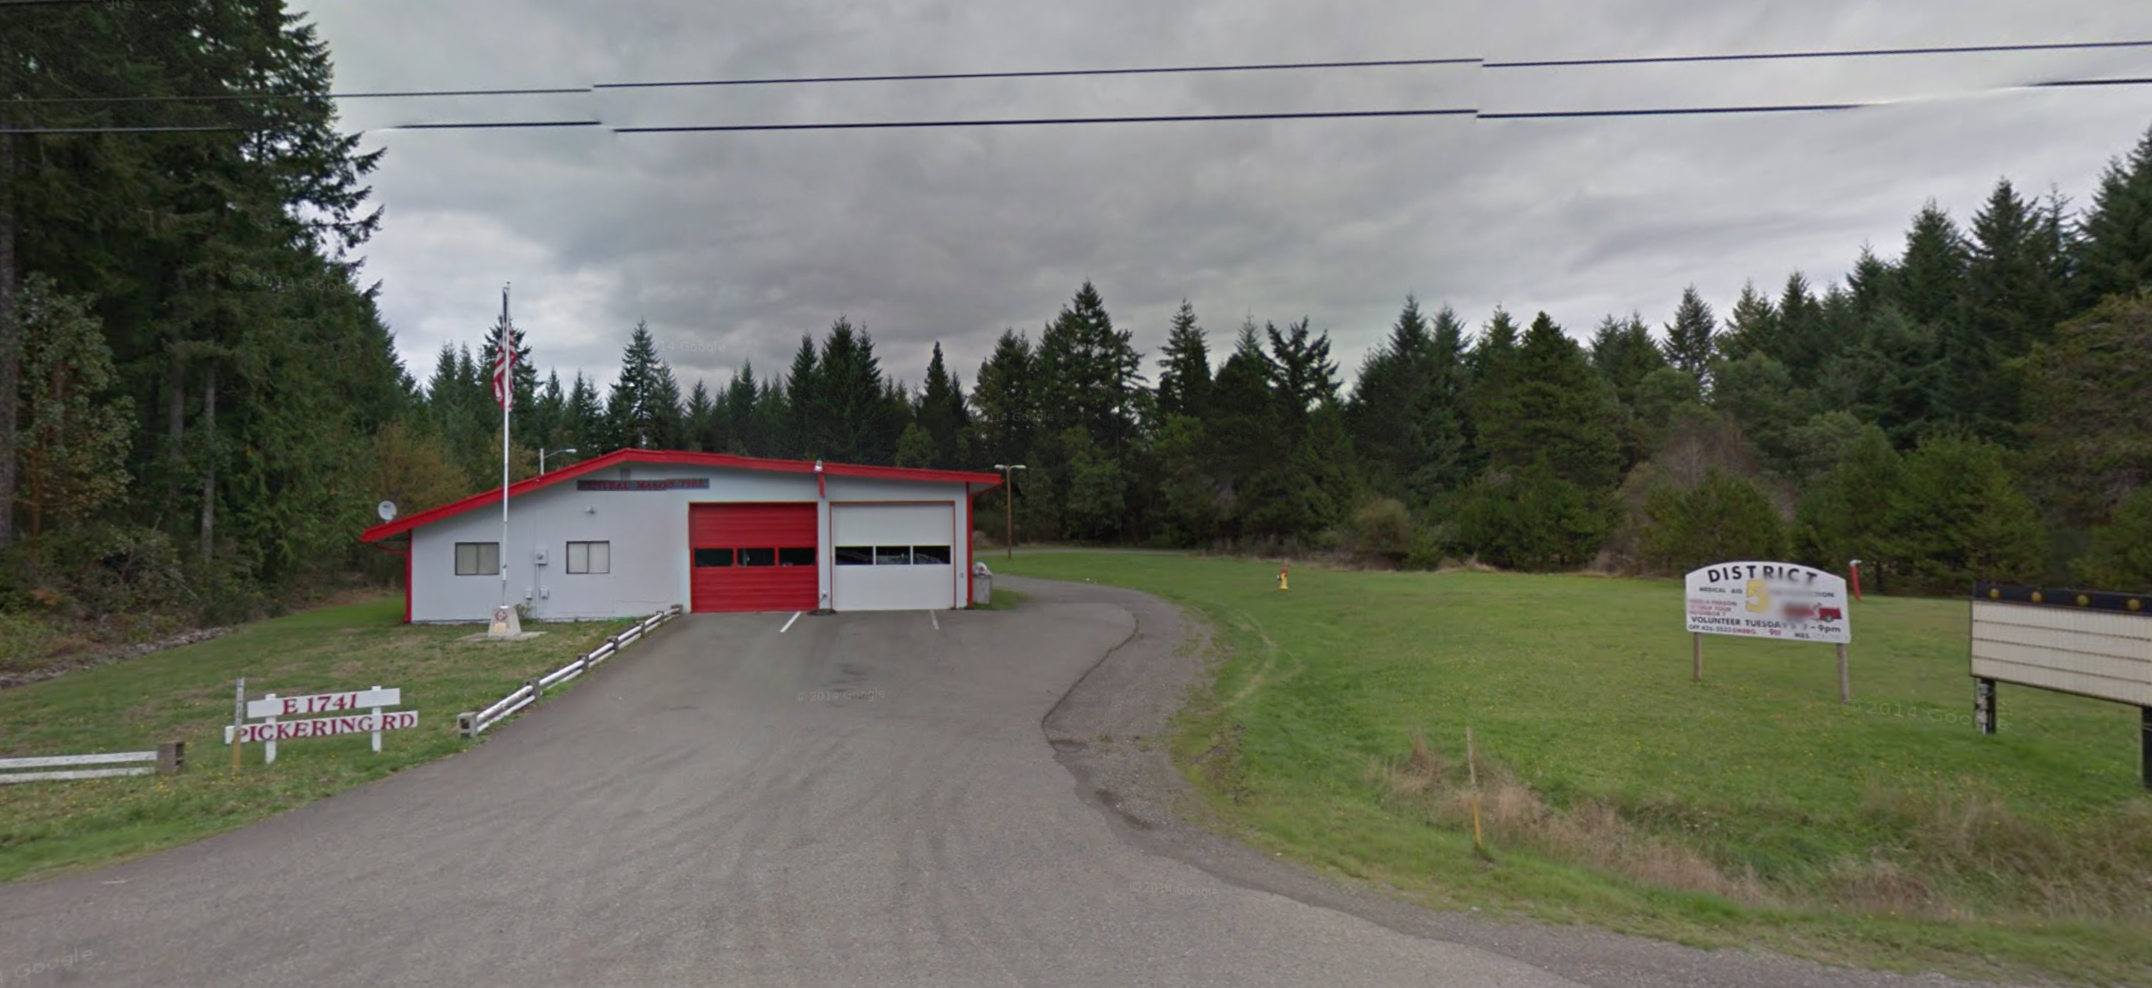 Station 5-7 - Spencer Lake Fire Station  1741 E Pickering Rd, Shelton WA